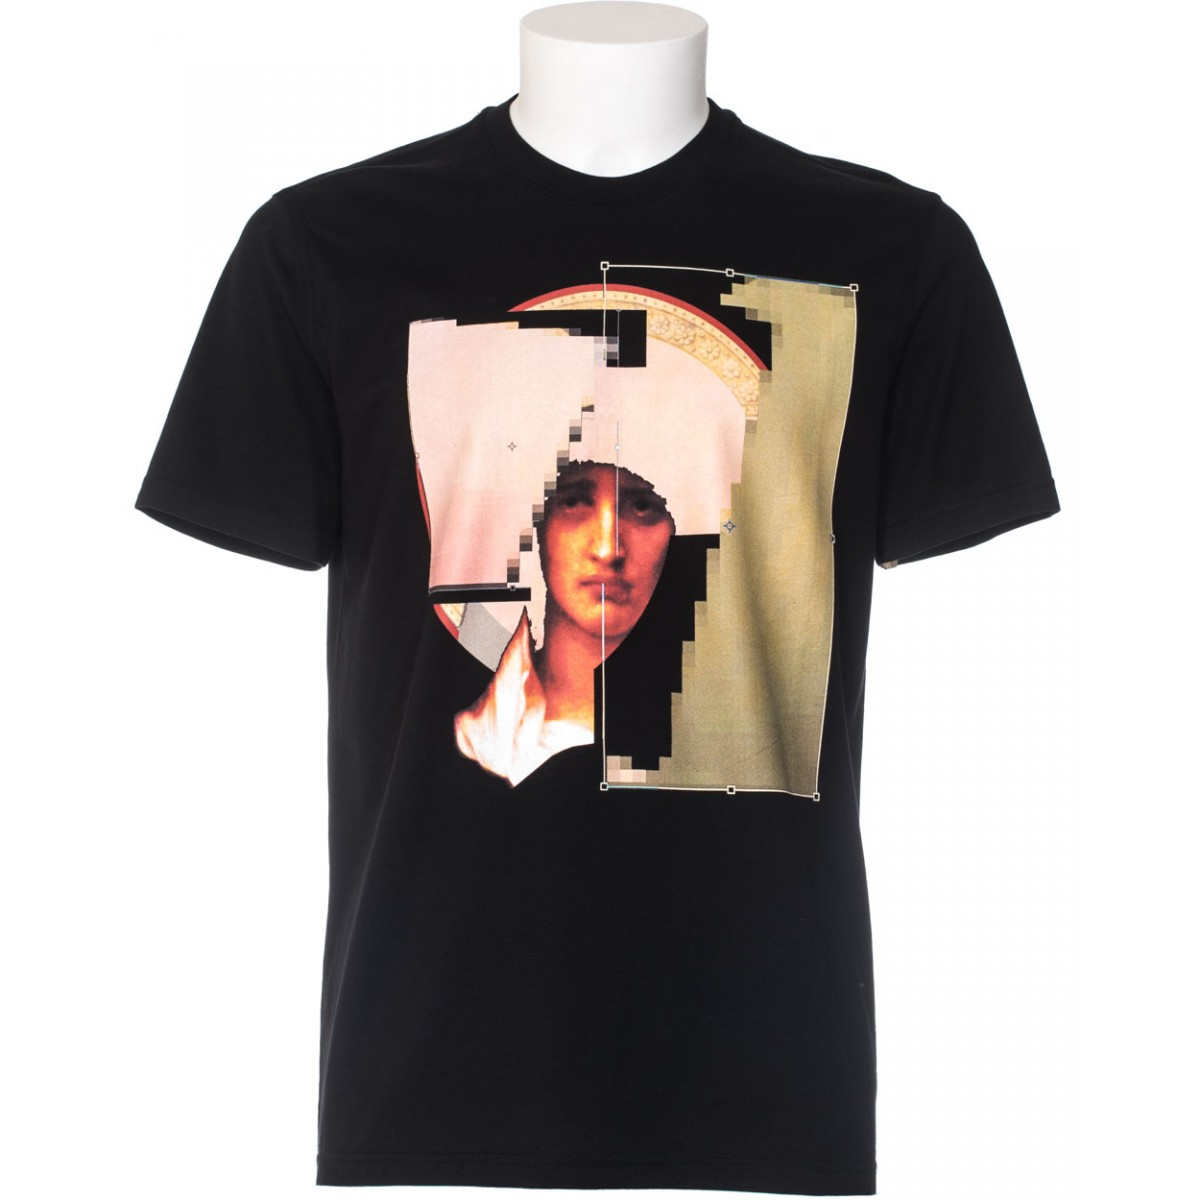 givenchy black t shirt cuban fit printed in black for men lyst. Black Bedroom Furniture Sets. Home Design Ideas